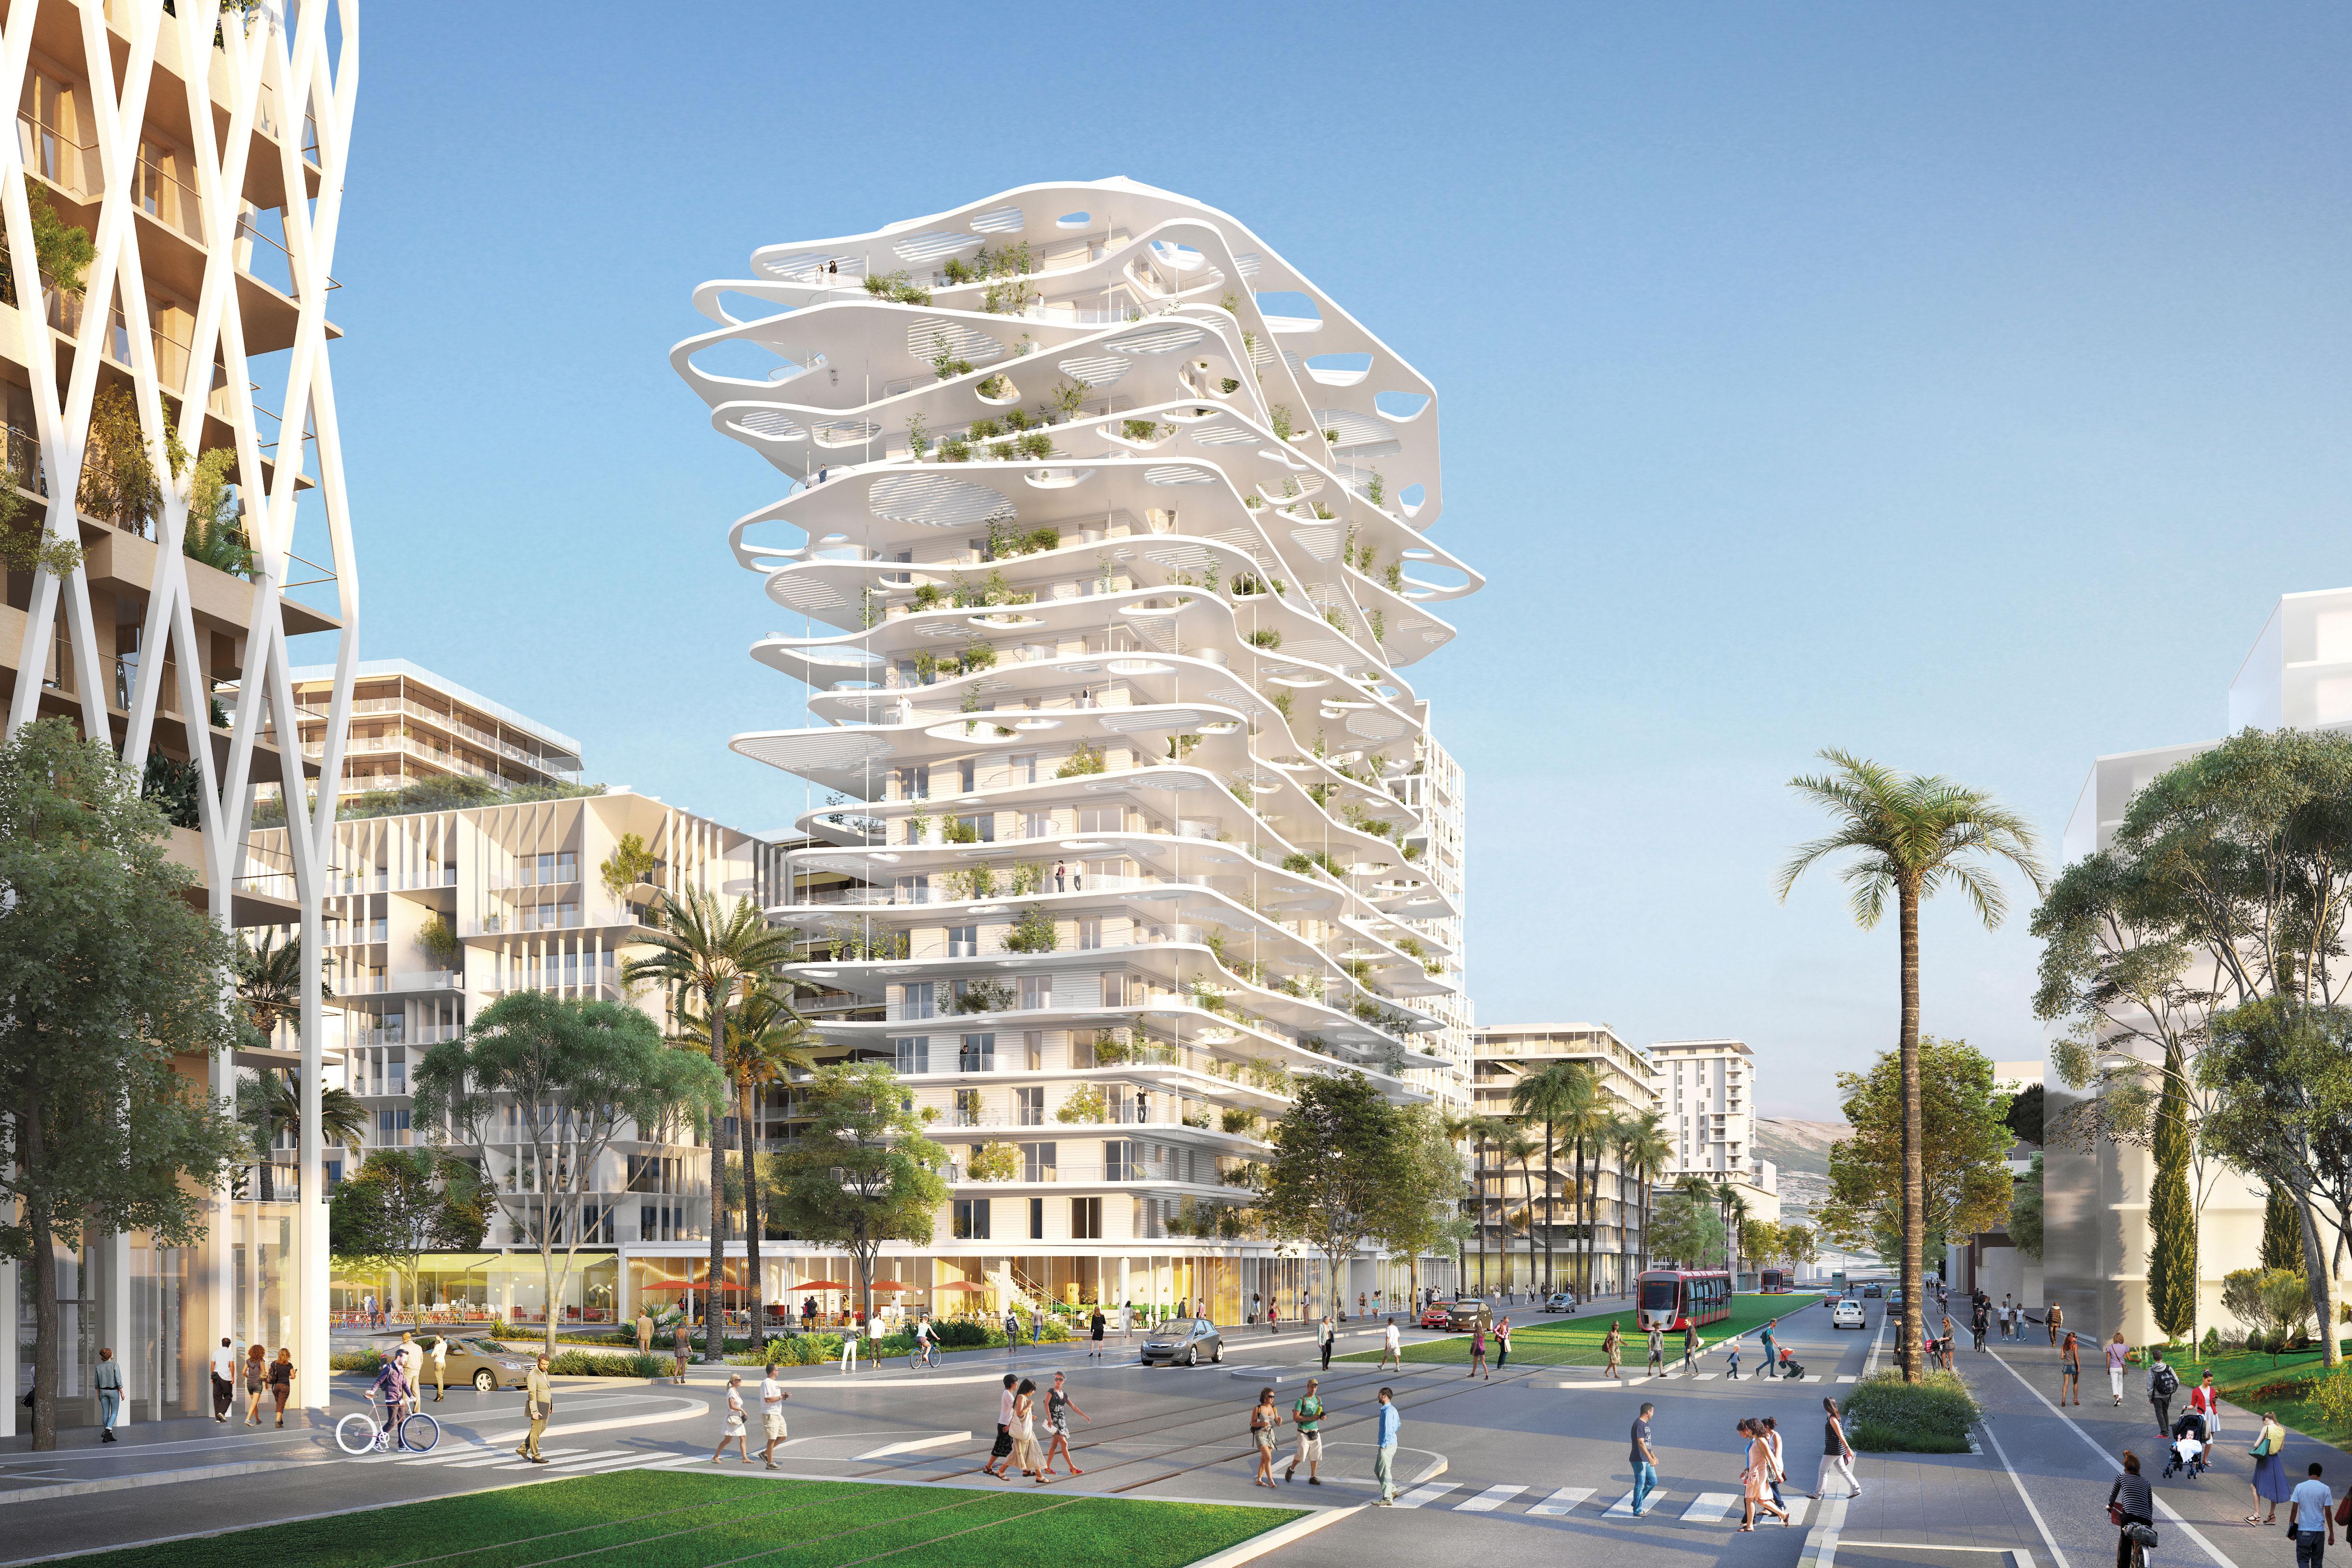 projet-urbanisme-nice-JOIA-MERIDIA-Sou-Fujimoto-Lambert-Lcnack-Pitch-Promotion